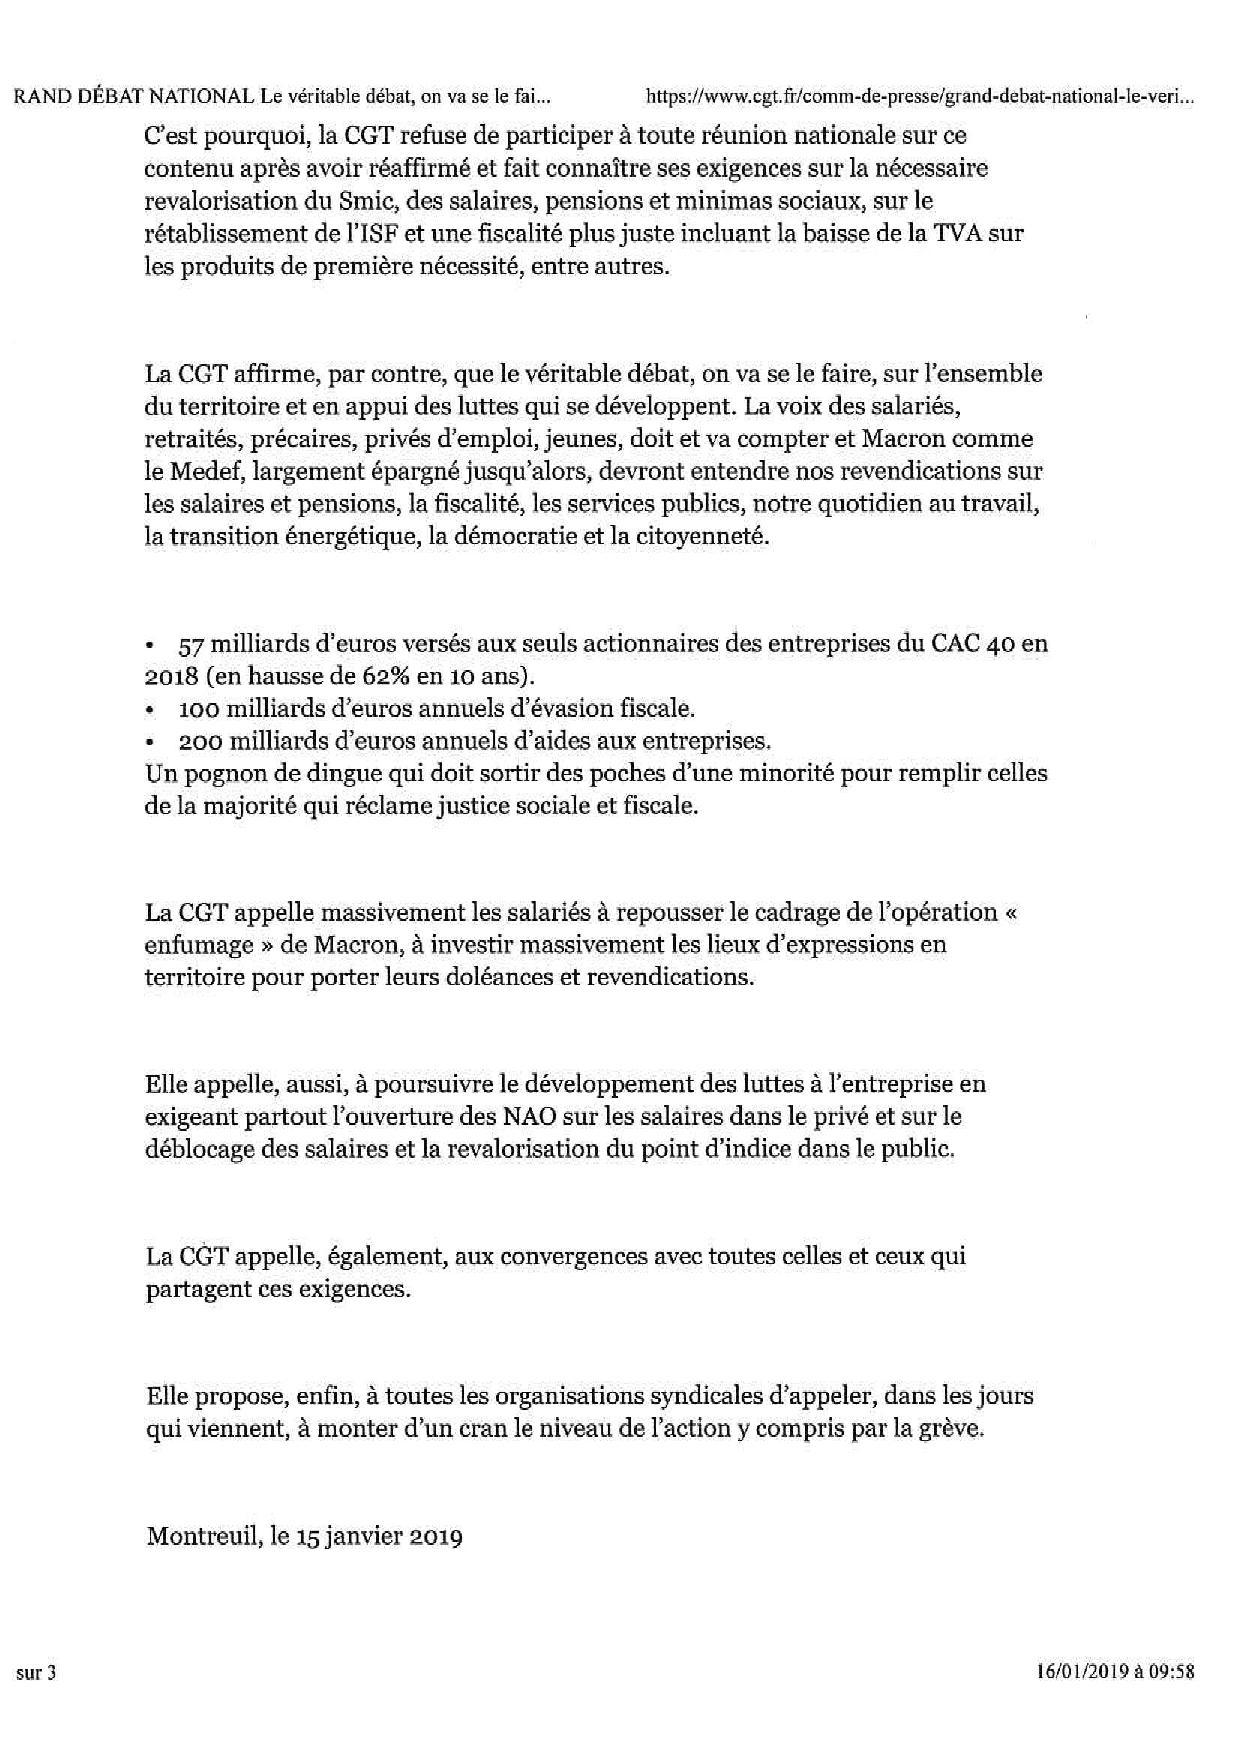 2019 01 15 grd debat nat cgt page 3